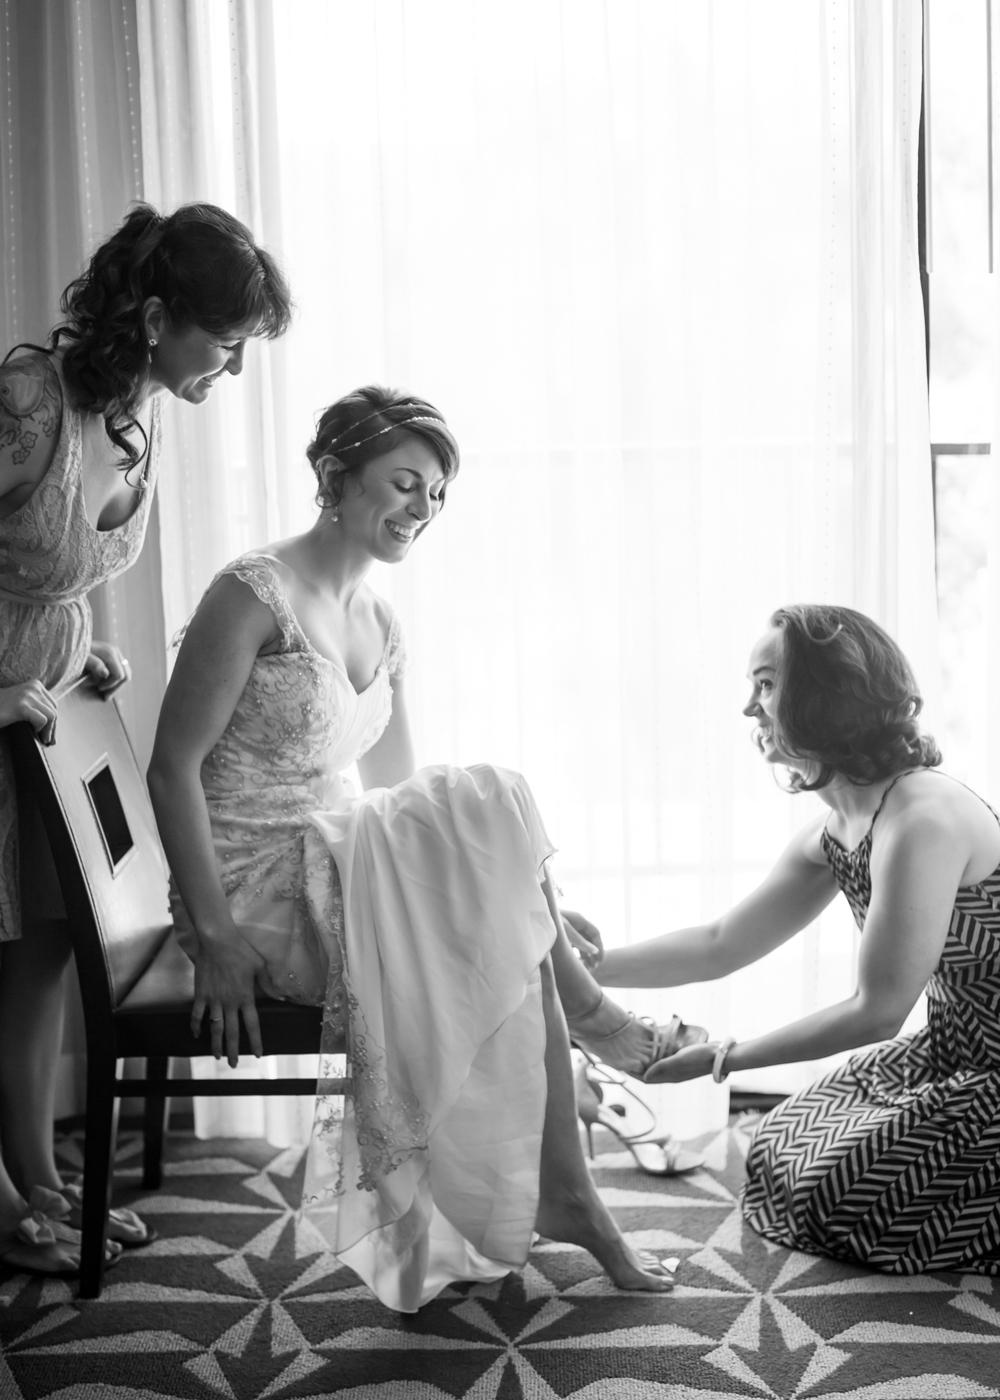 walnut-grove-los-angeles-wedding-photography-lilouette-04.jpg